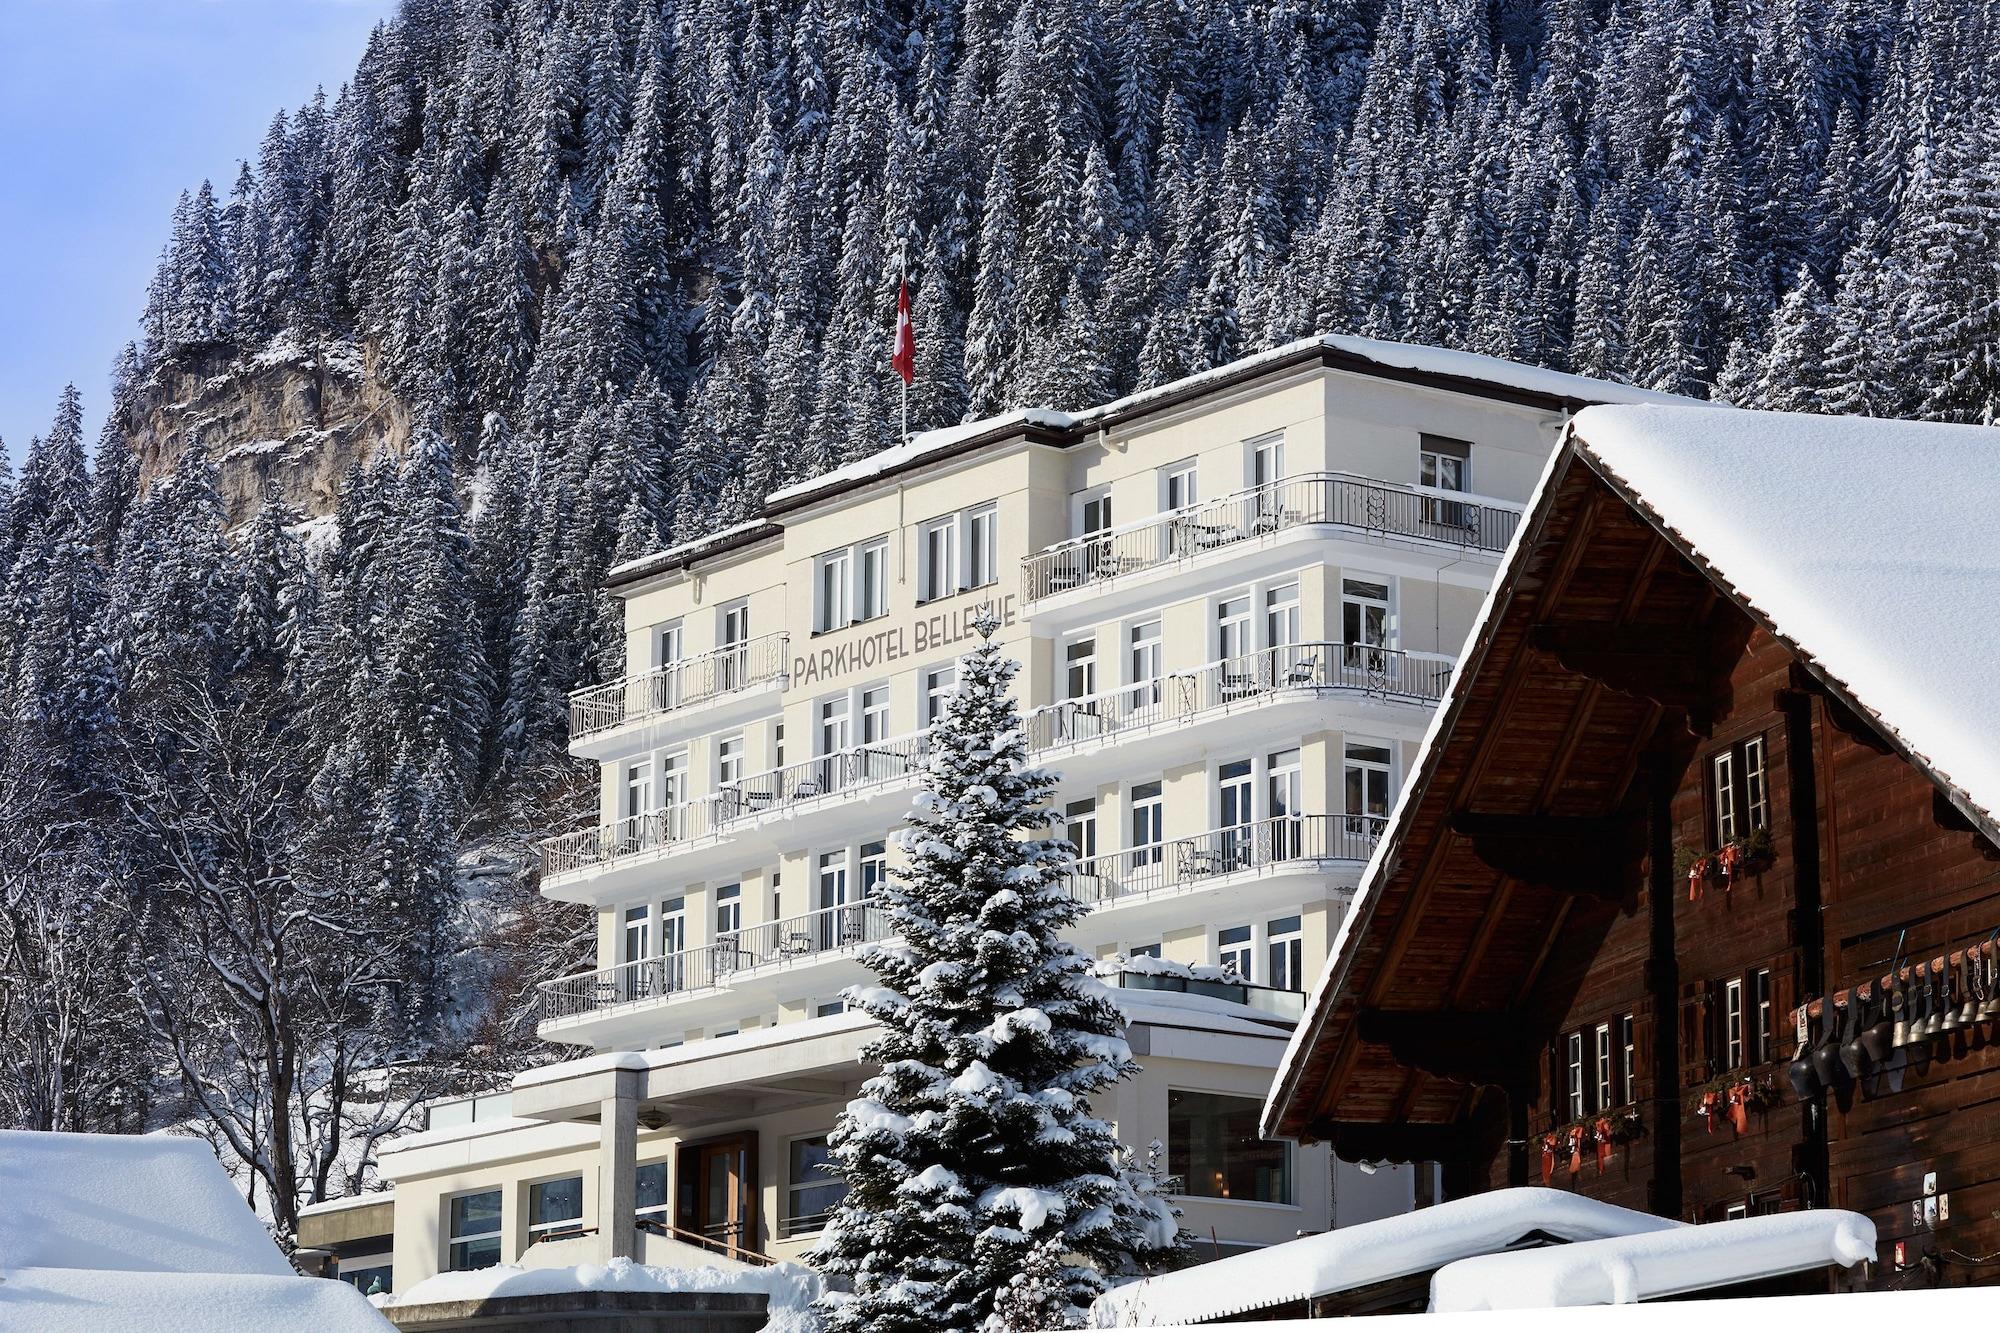 Parkhotel Bellevue & Spa, Frutigen